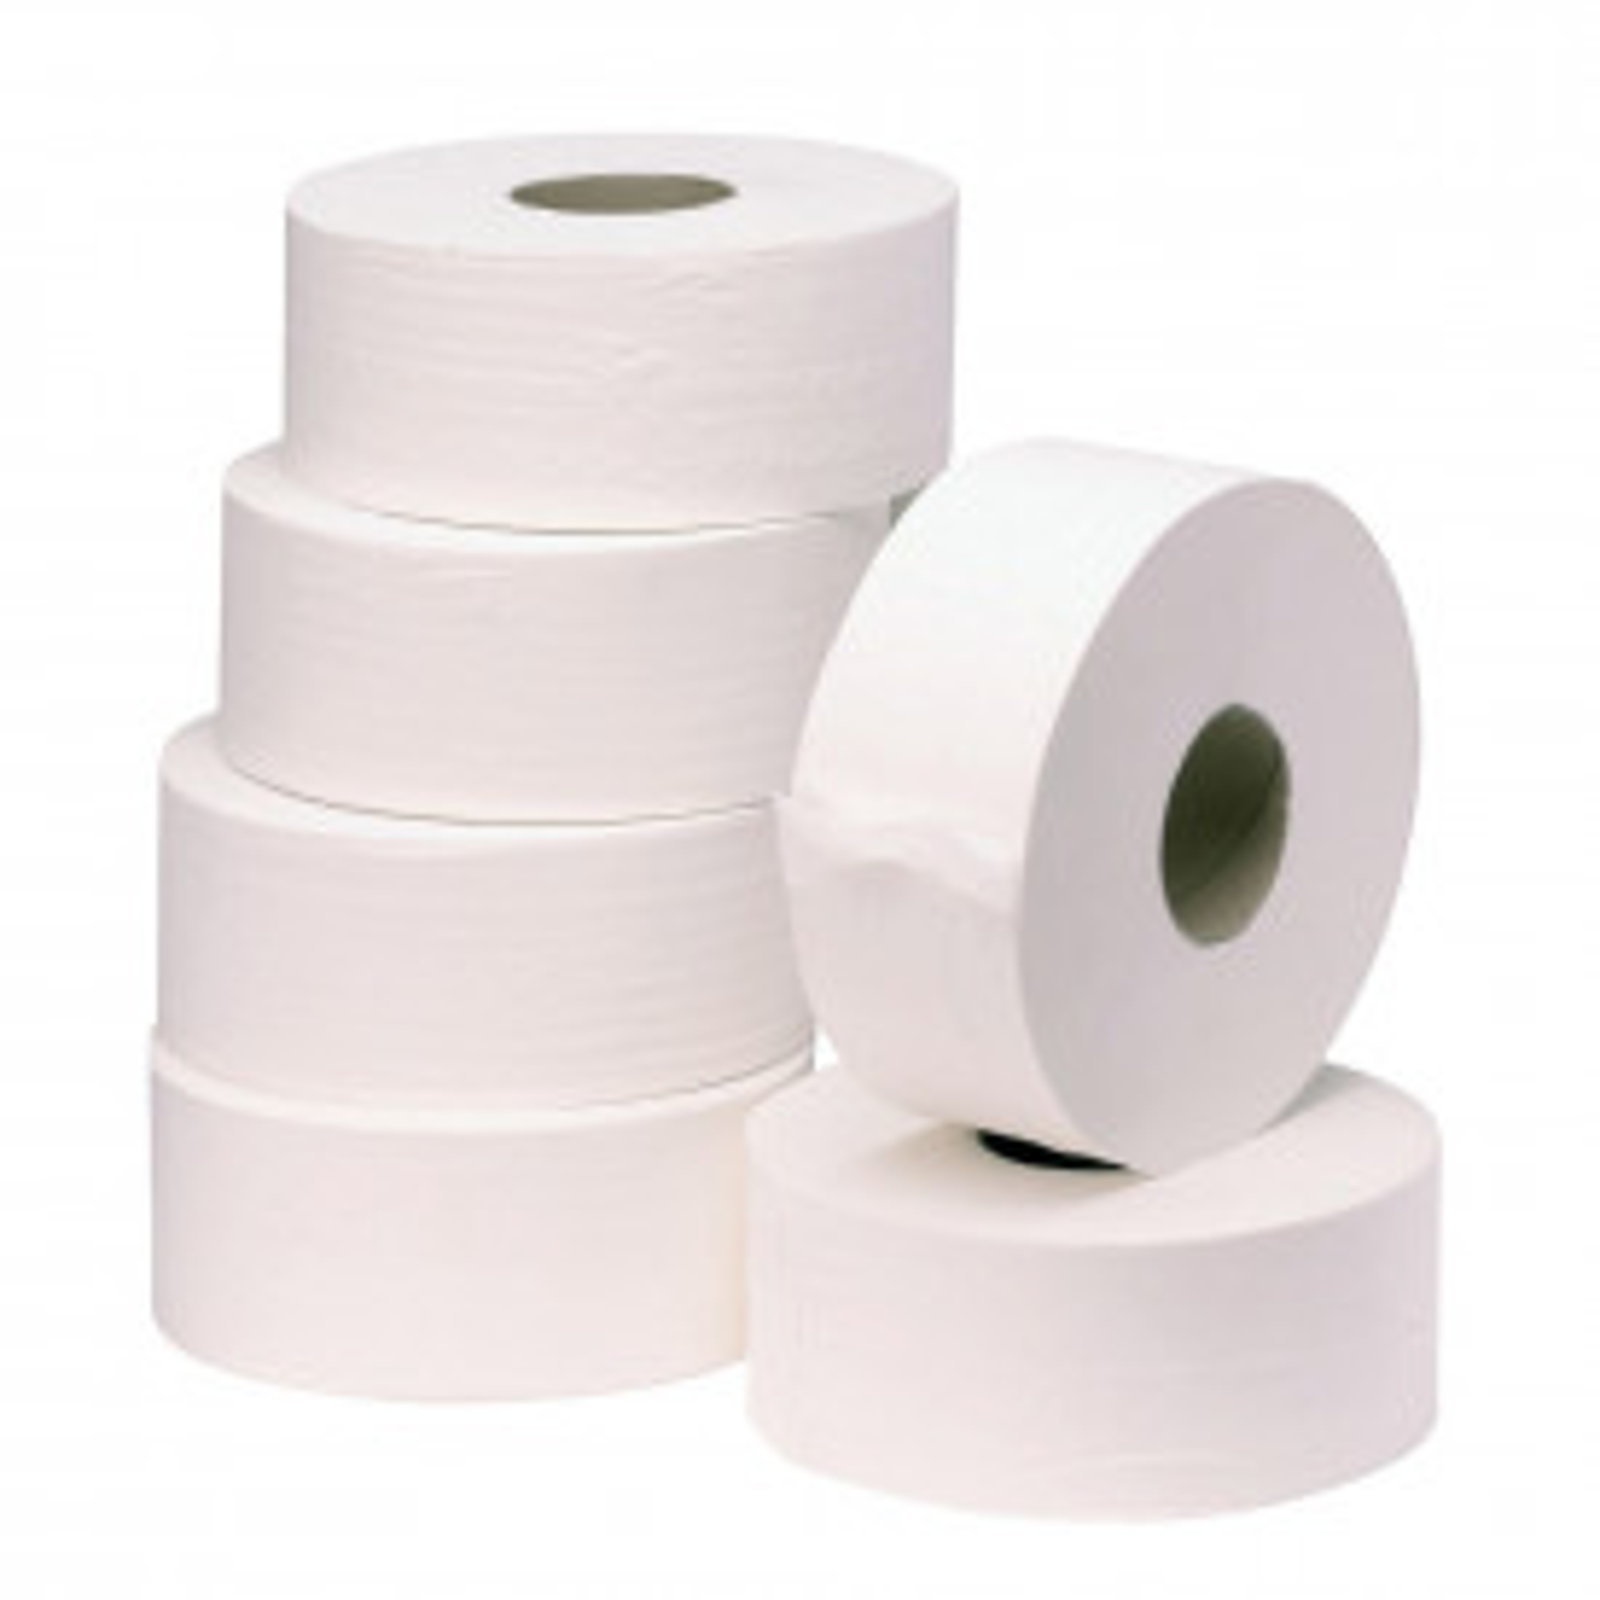 Consortium Jumbo Toilet Rolls 1 Ply